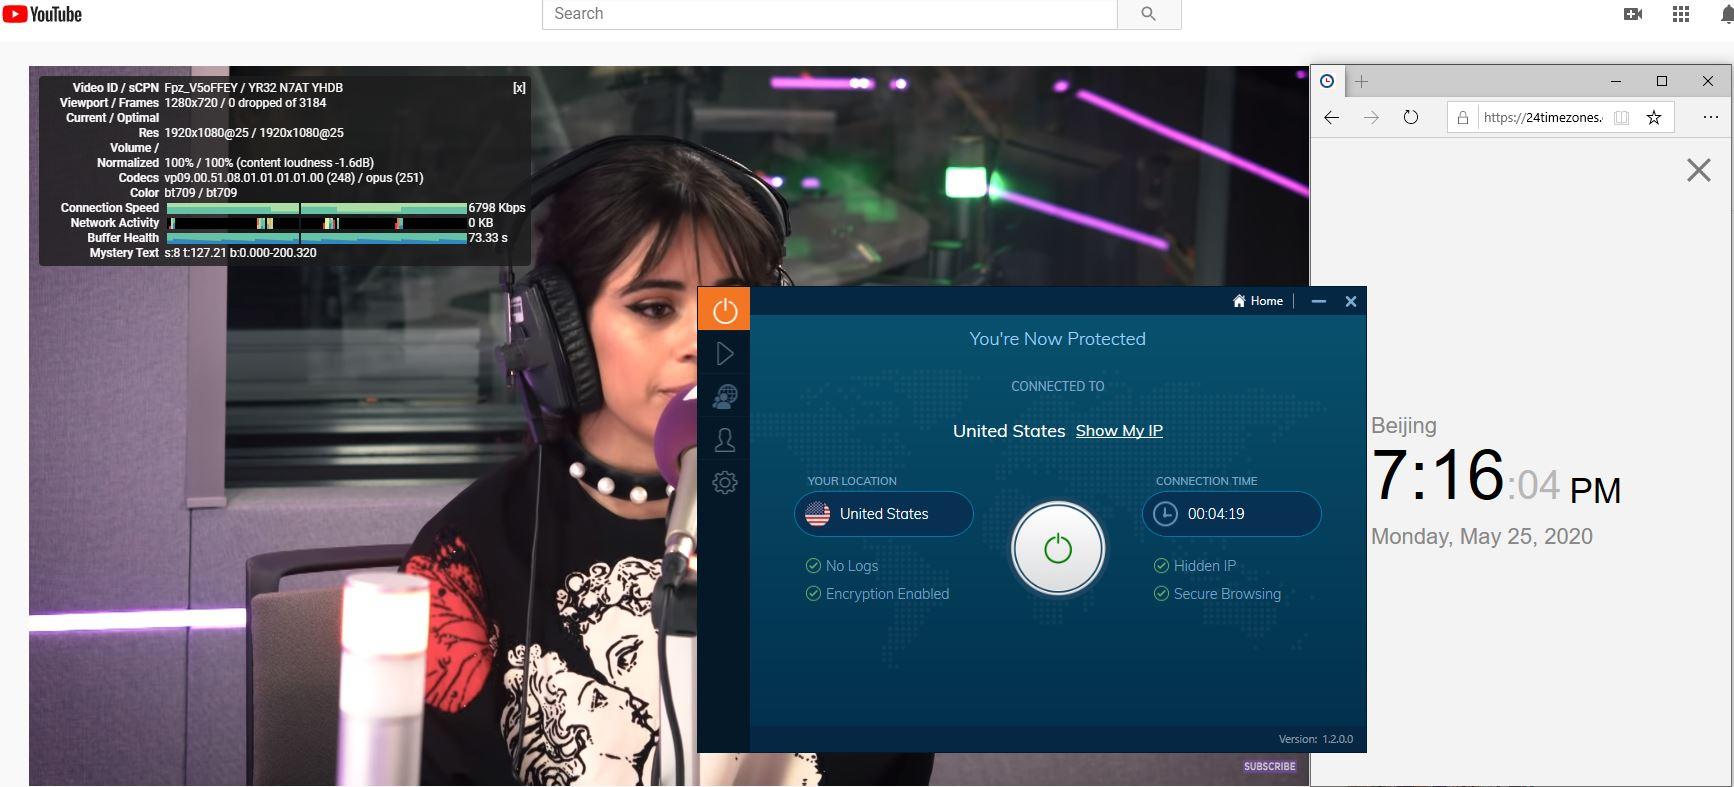 Windows10 IvacyVPN USA 中国VPN 翻墙 科学上网 测速-20200525